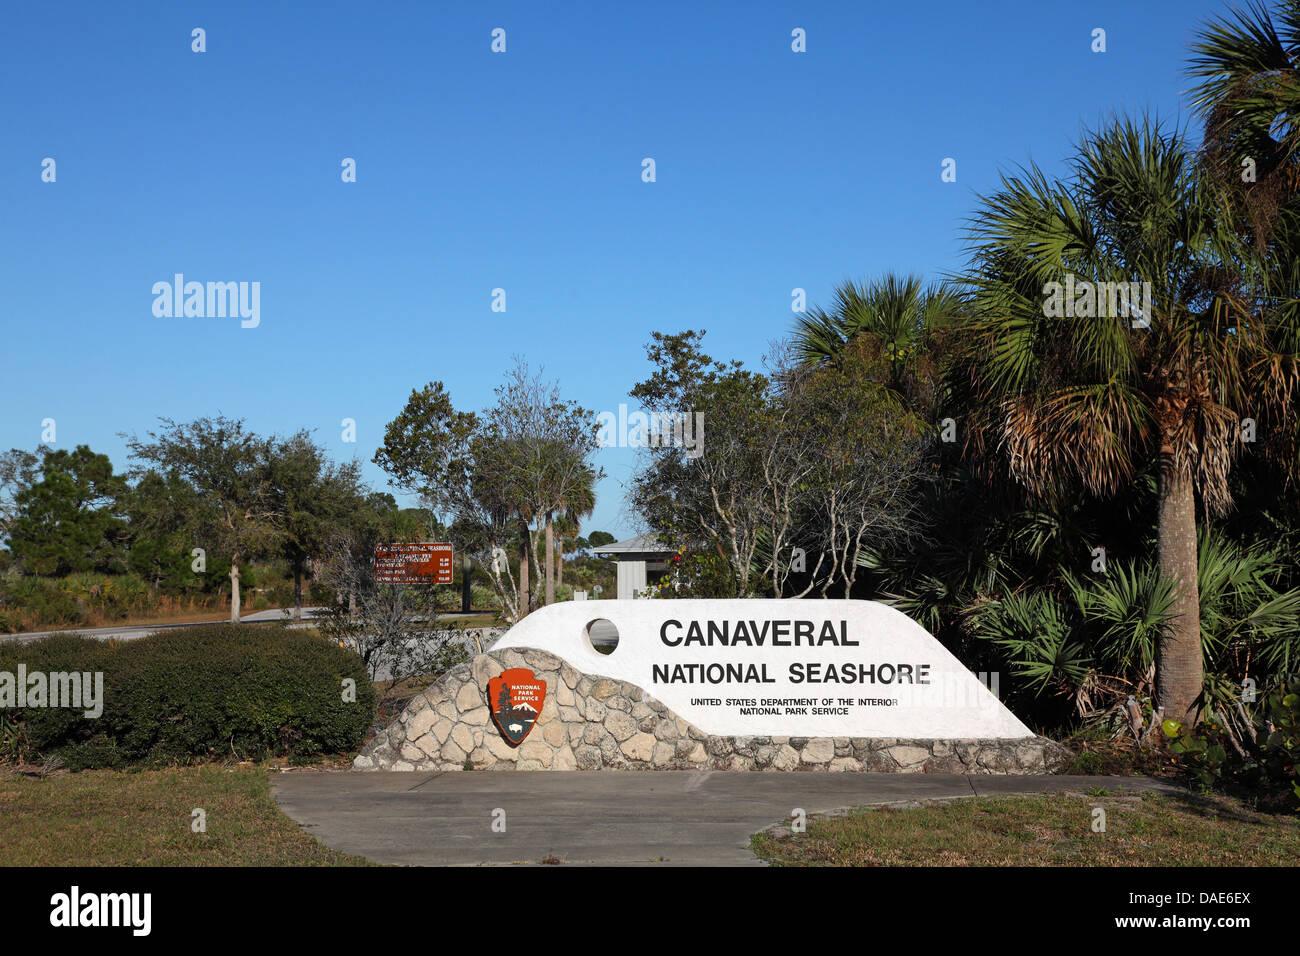 "Entrée de la zone de conservation ""Canaveral National Seashore', USA, Floride, Merritt Island Photo Stock"